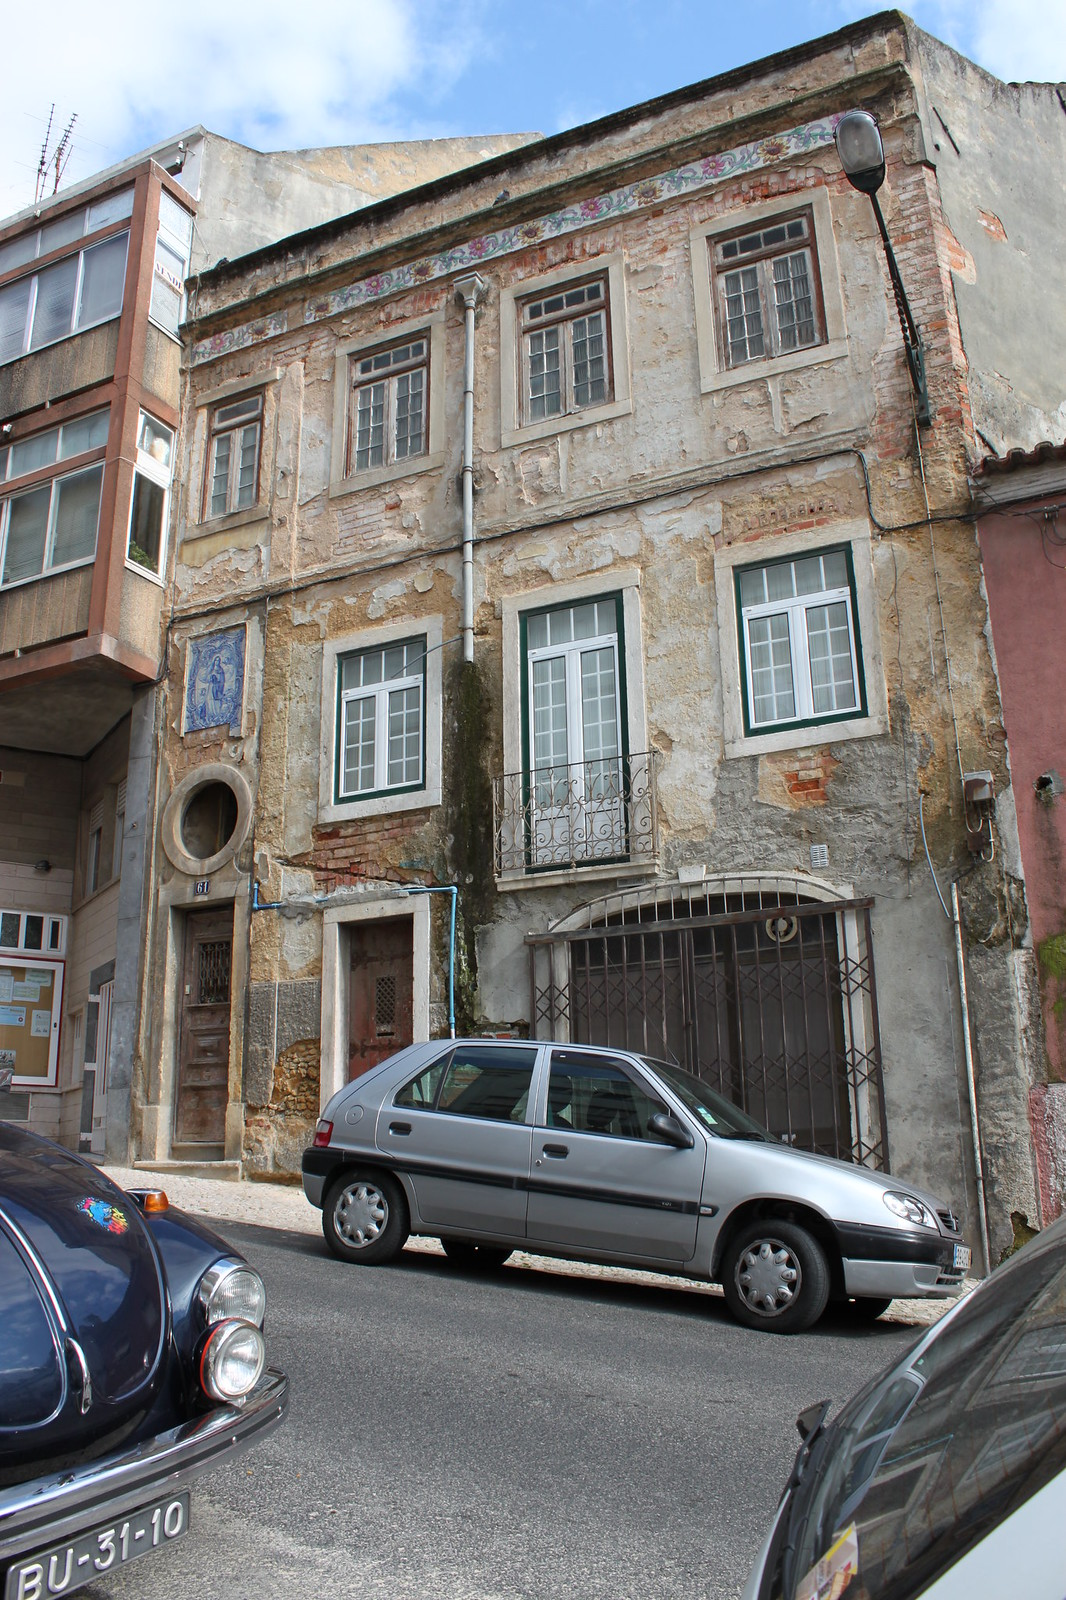 Rua Marques da Silva, 61, Lisboa (N.º 762, II.ª série — © 2010)